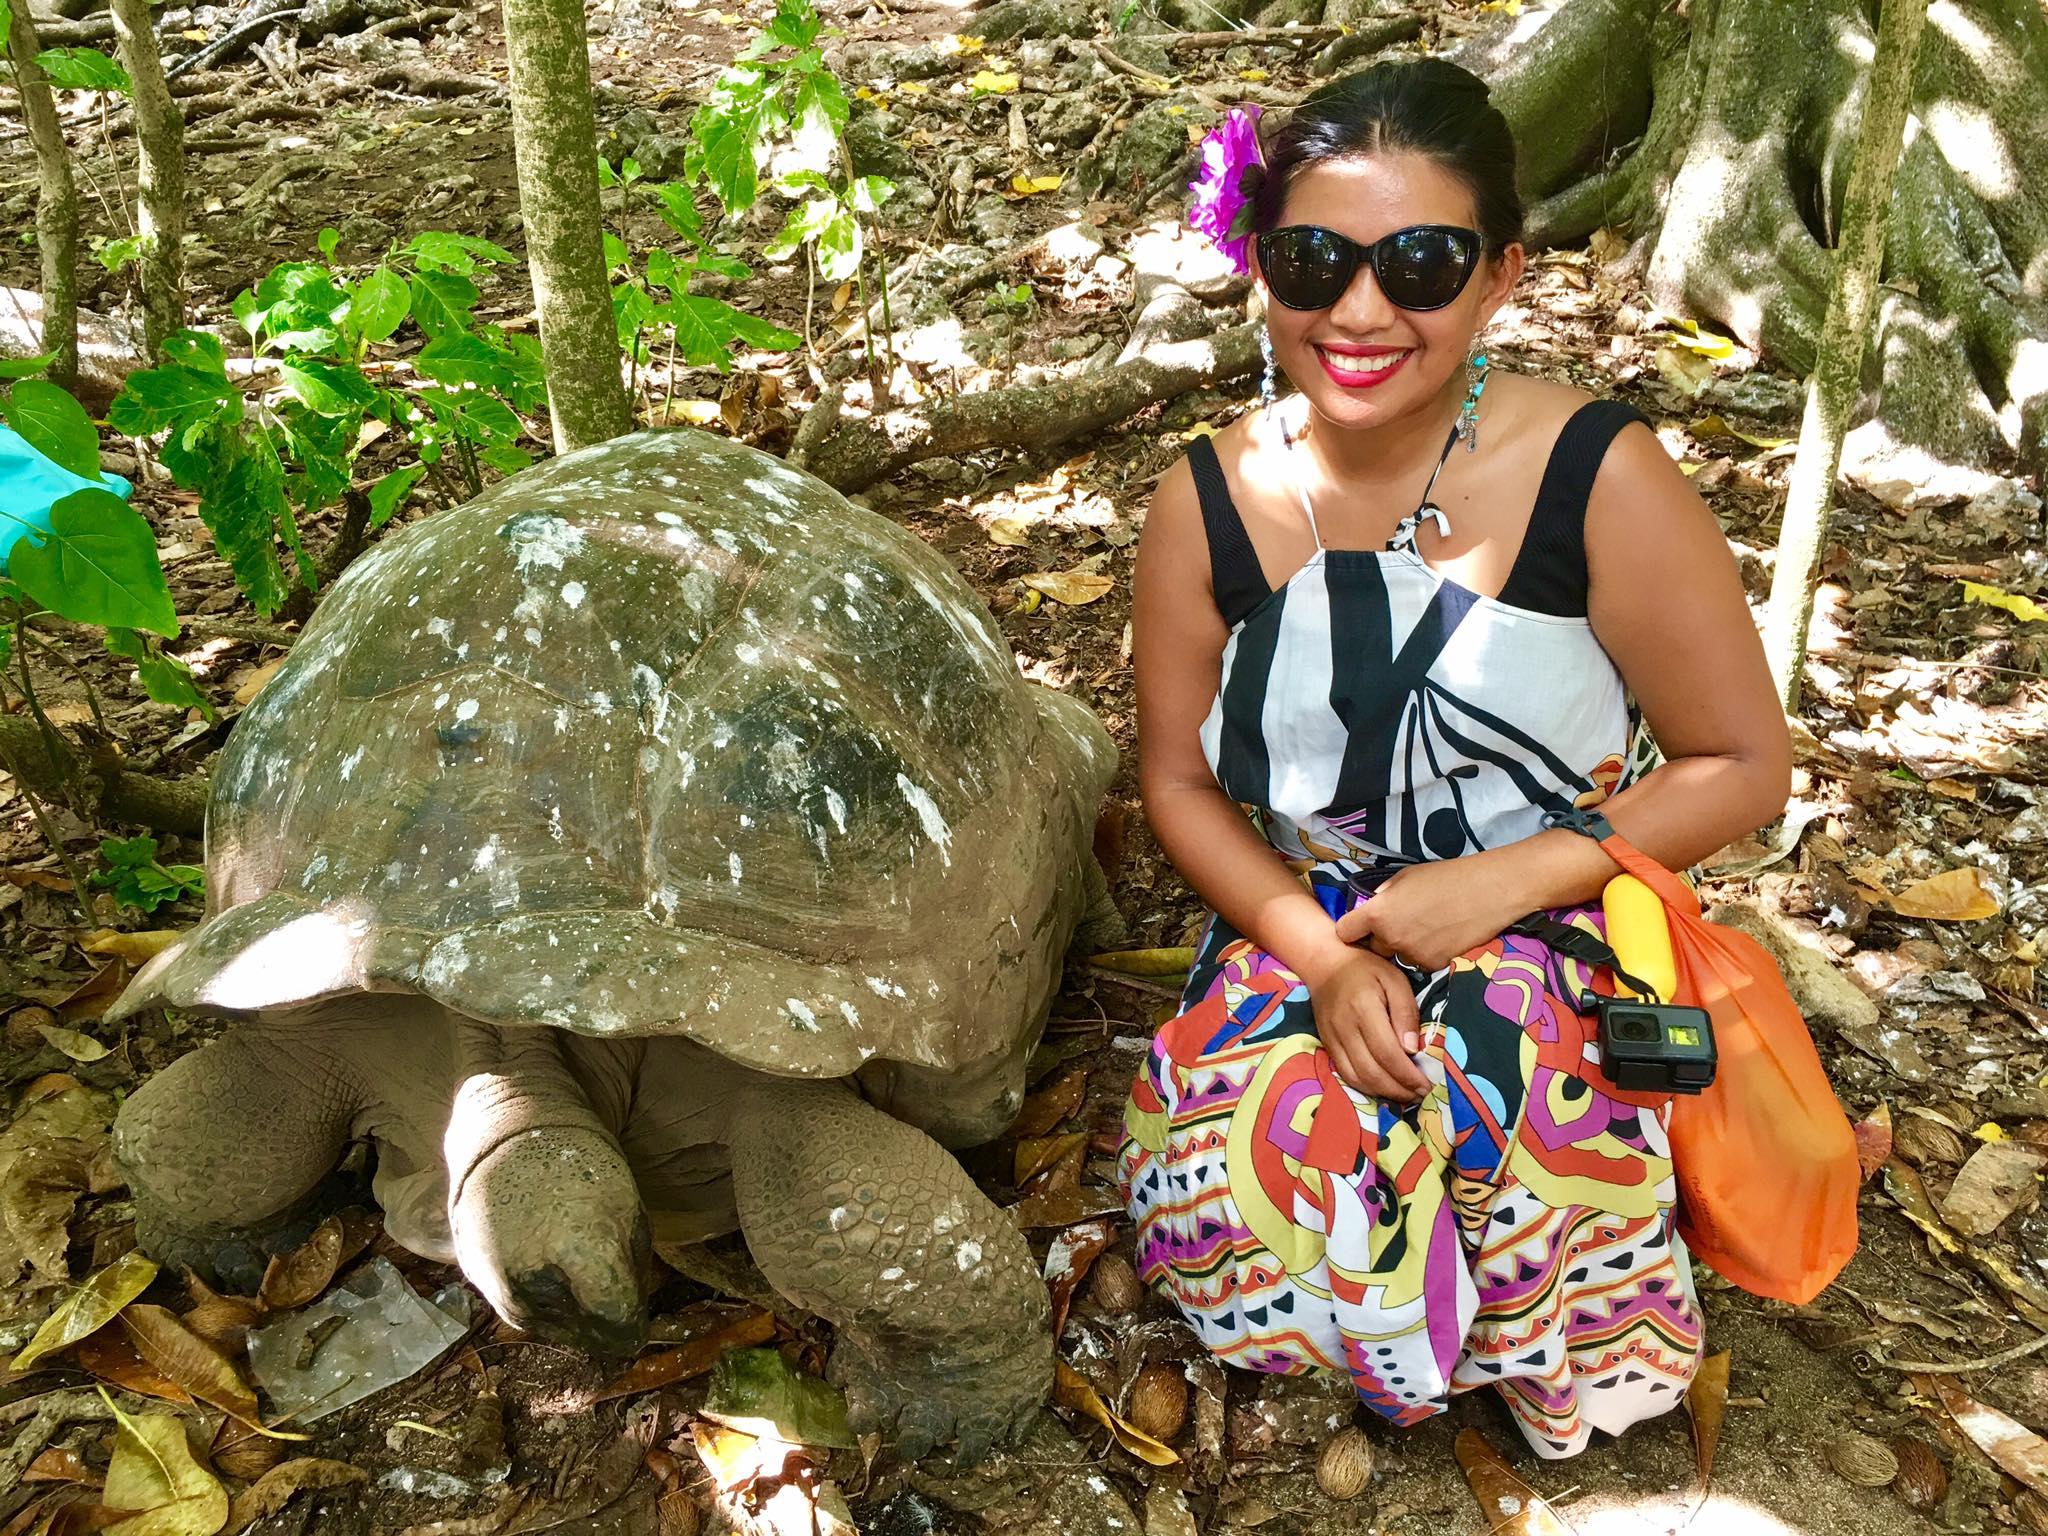 Praslin Travel Guide - A Luxurious Island Paradise in Seychelles 28.jpg